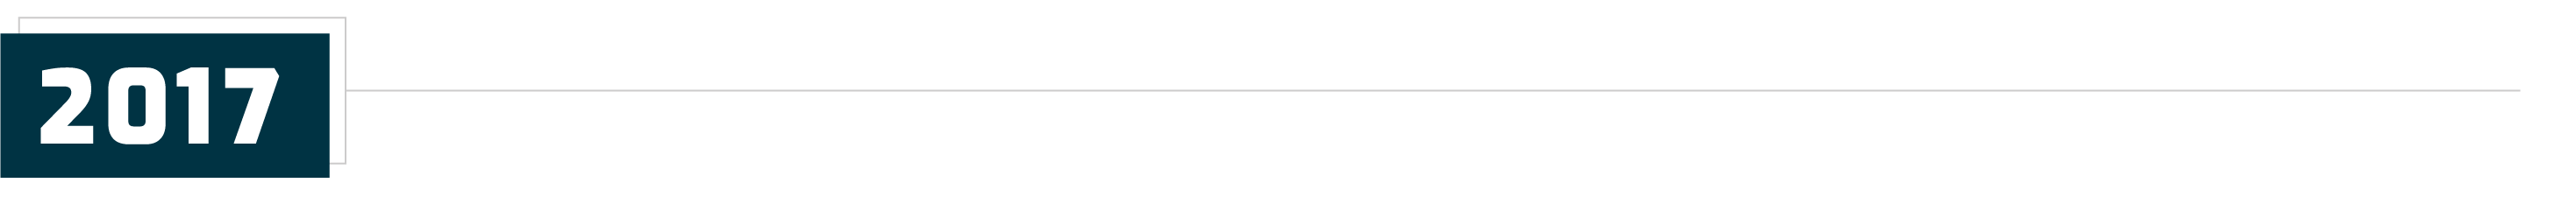 Choice Bank Timeline 2017